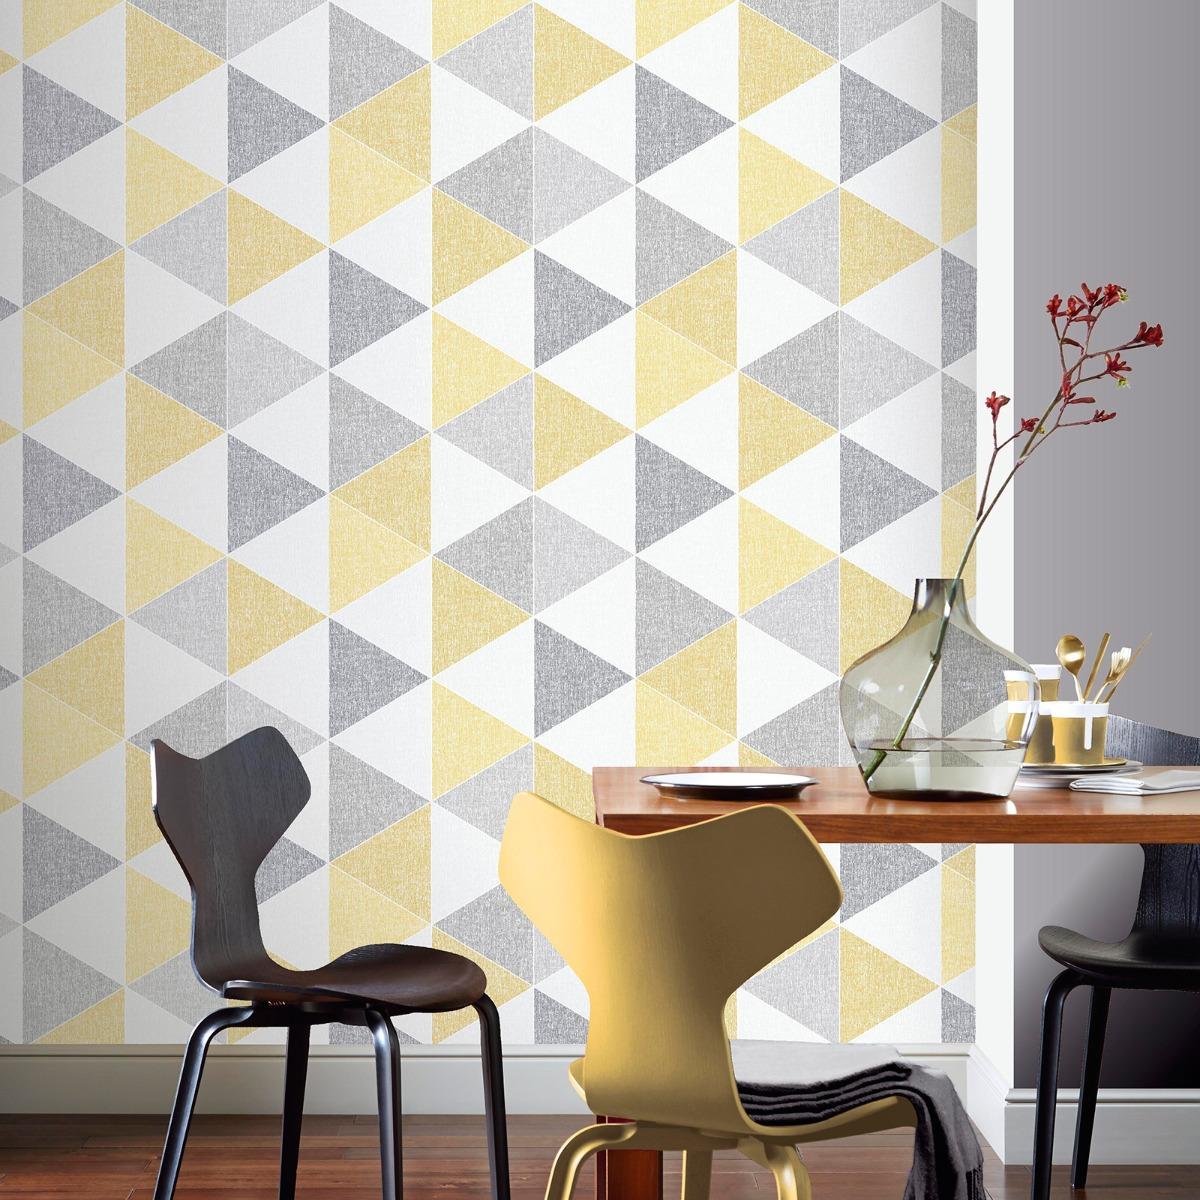 ART268 - Scandi Geo Triangle Wallpaper - Yellow and Grey - Arthouse 908206